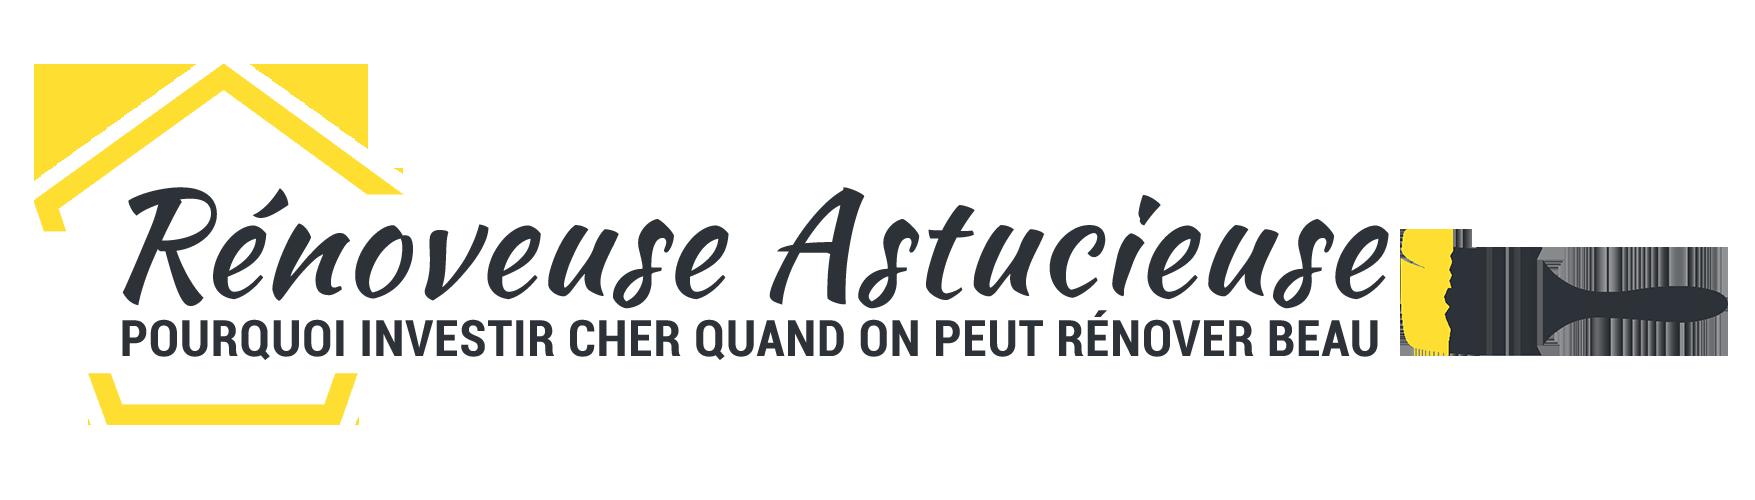 Rénoveuse Astucieuse - Pourquoi investir cher quand on peut rénover beau !